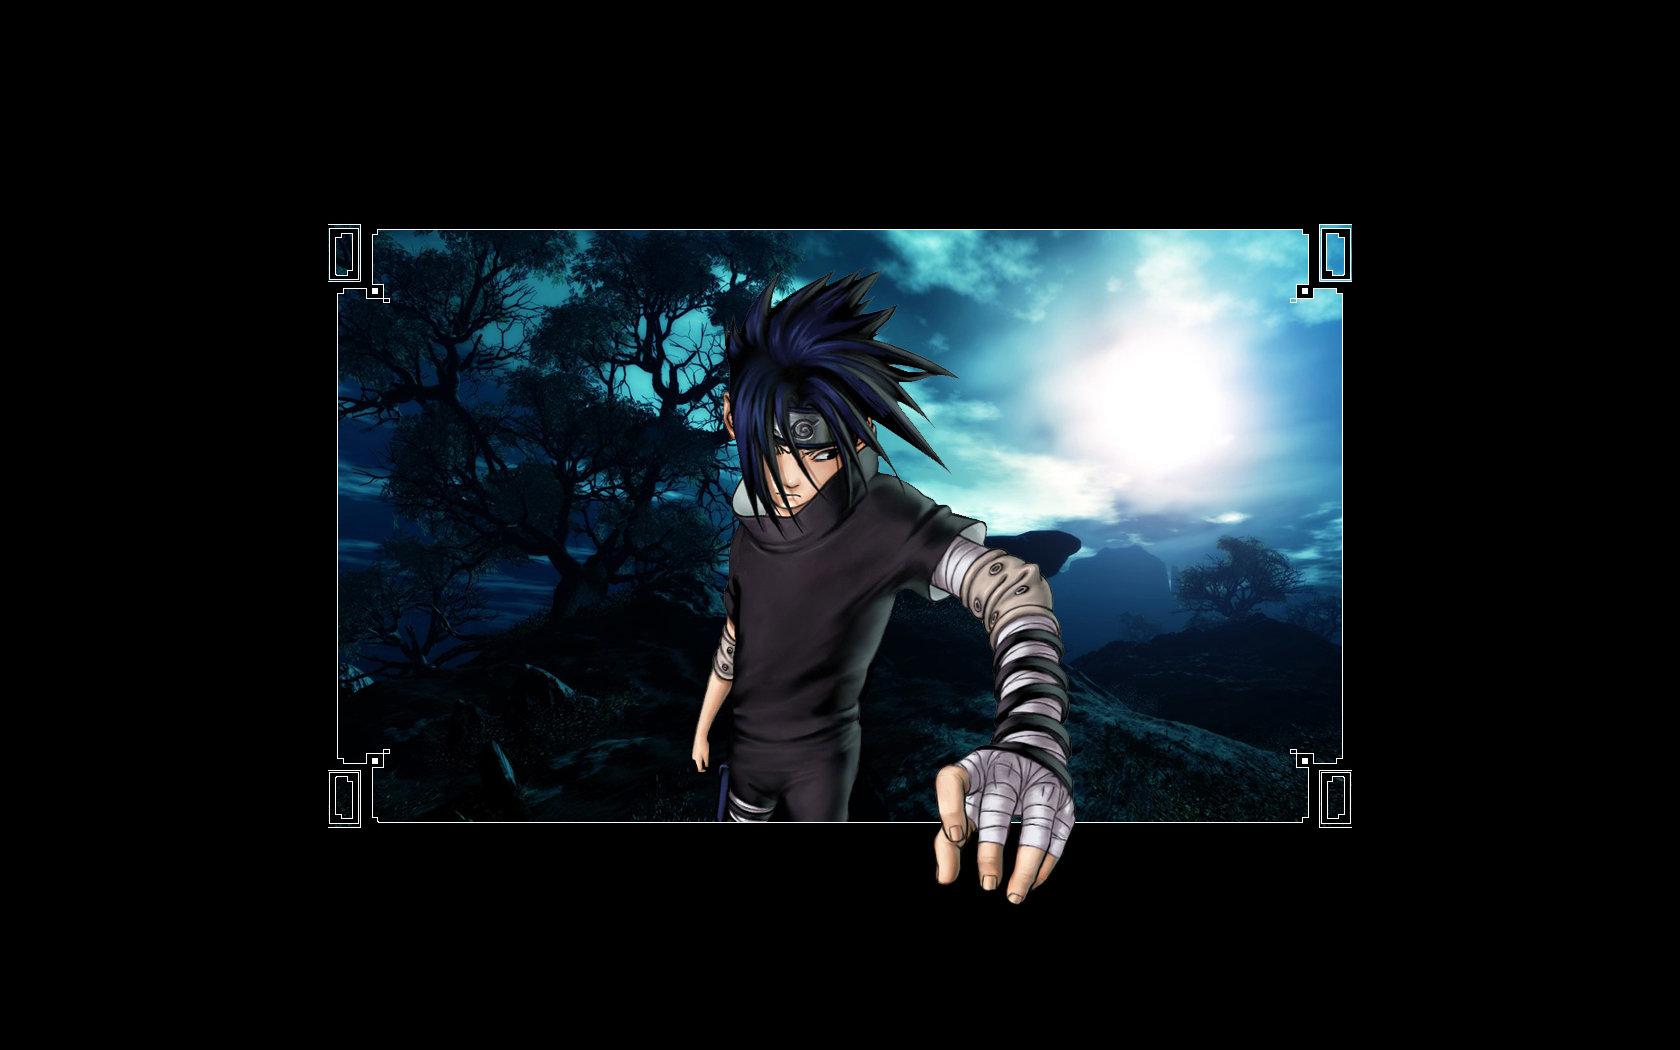 sasuke uchiha wallpapers hd for desktop backgrounds